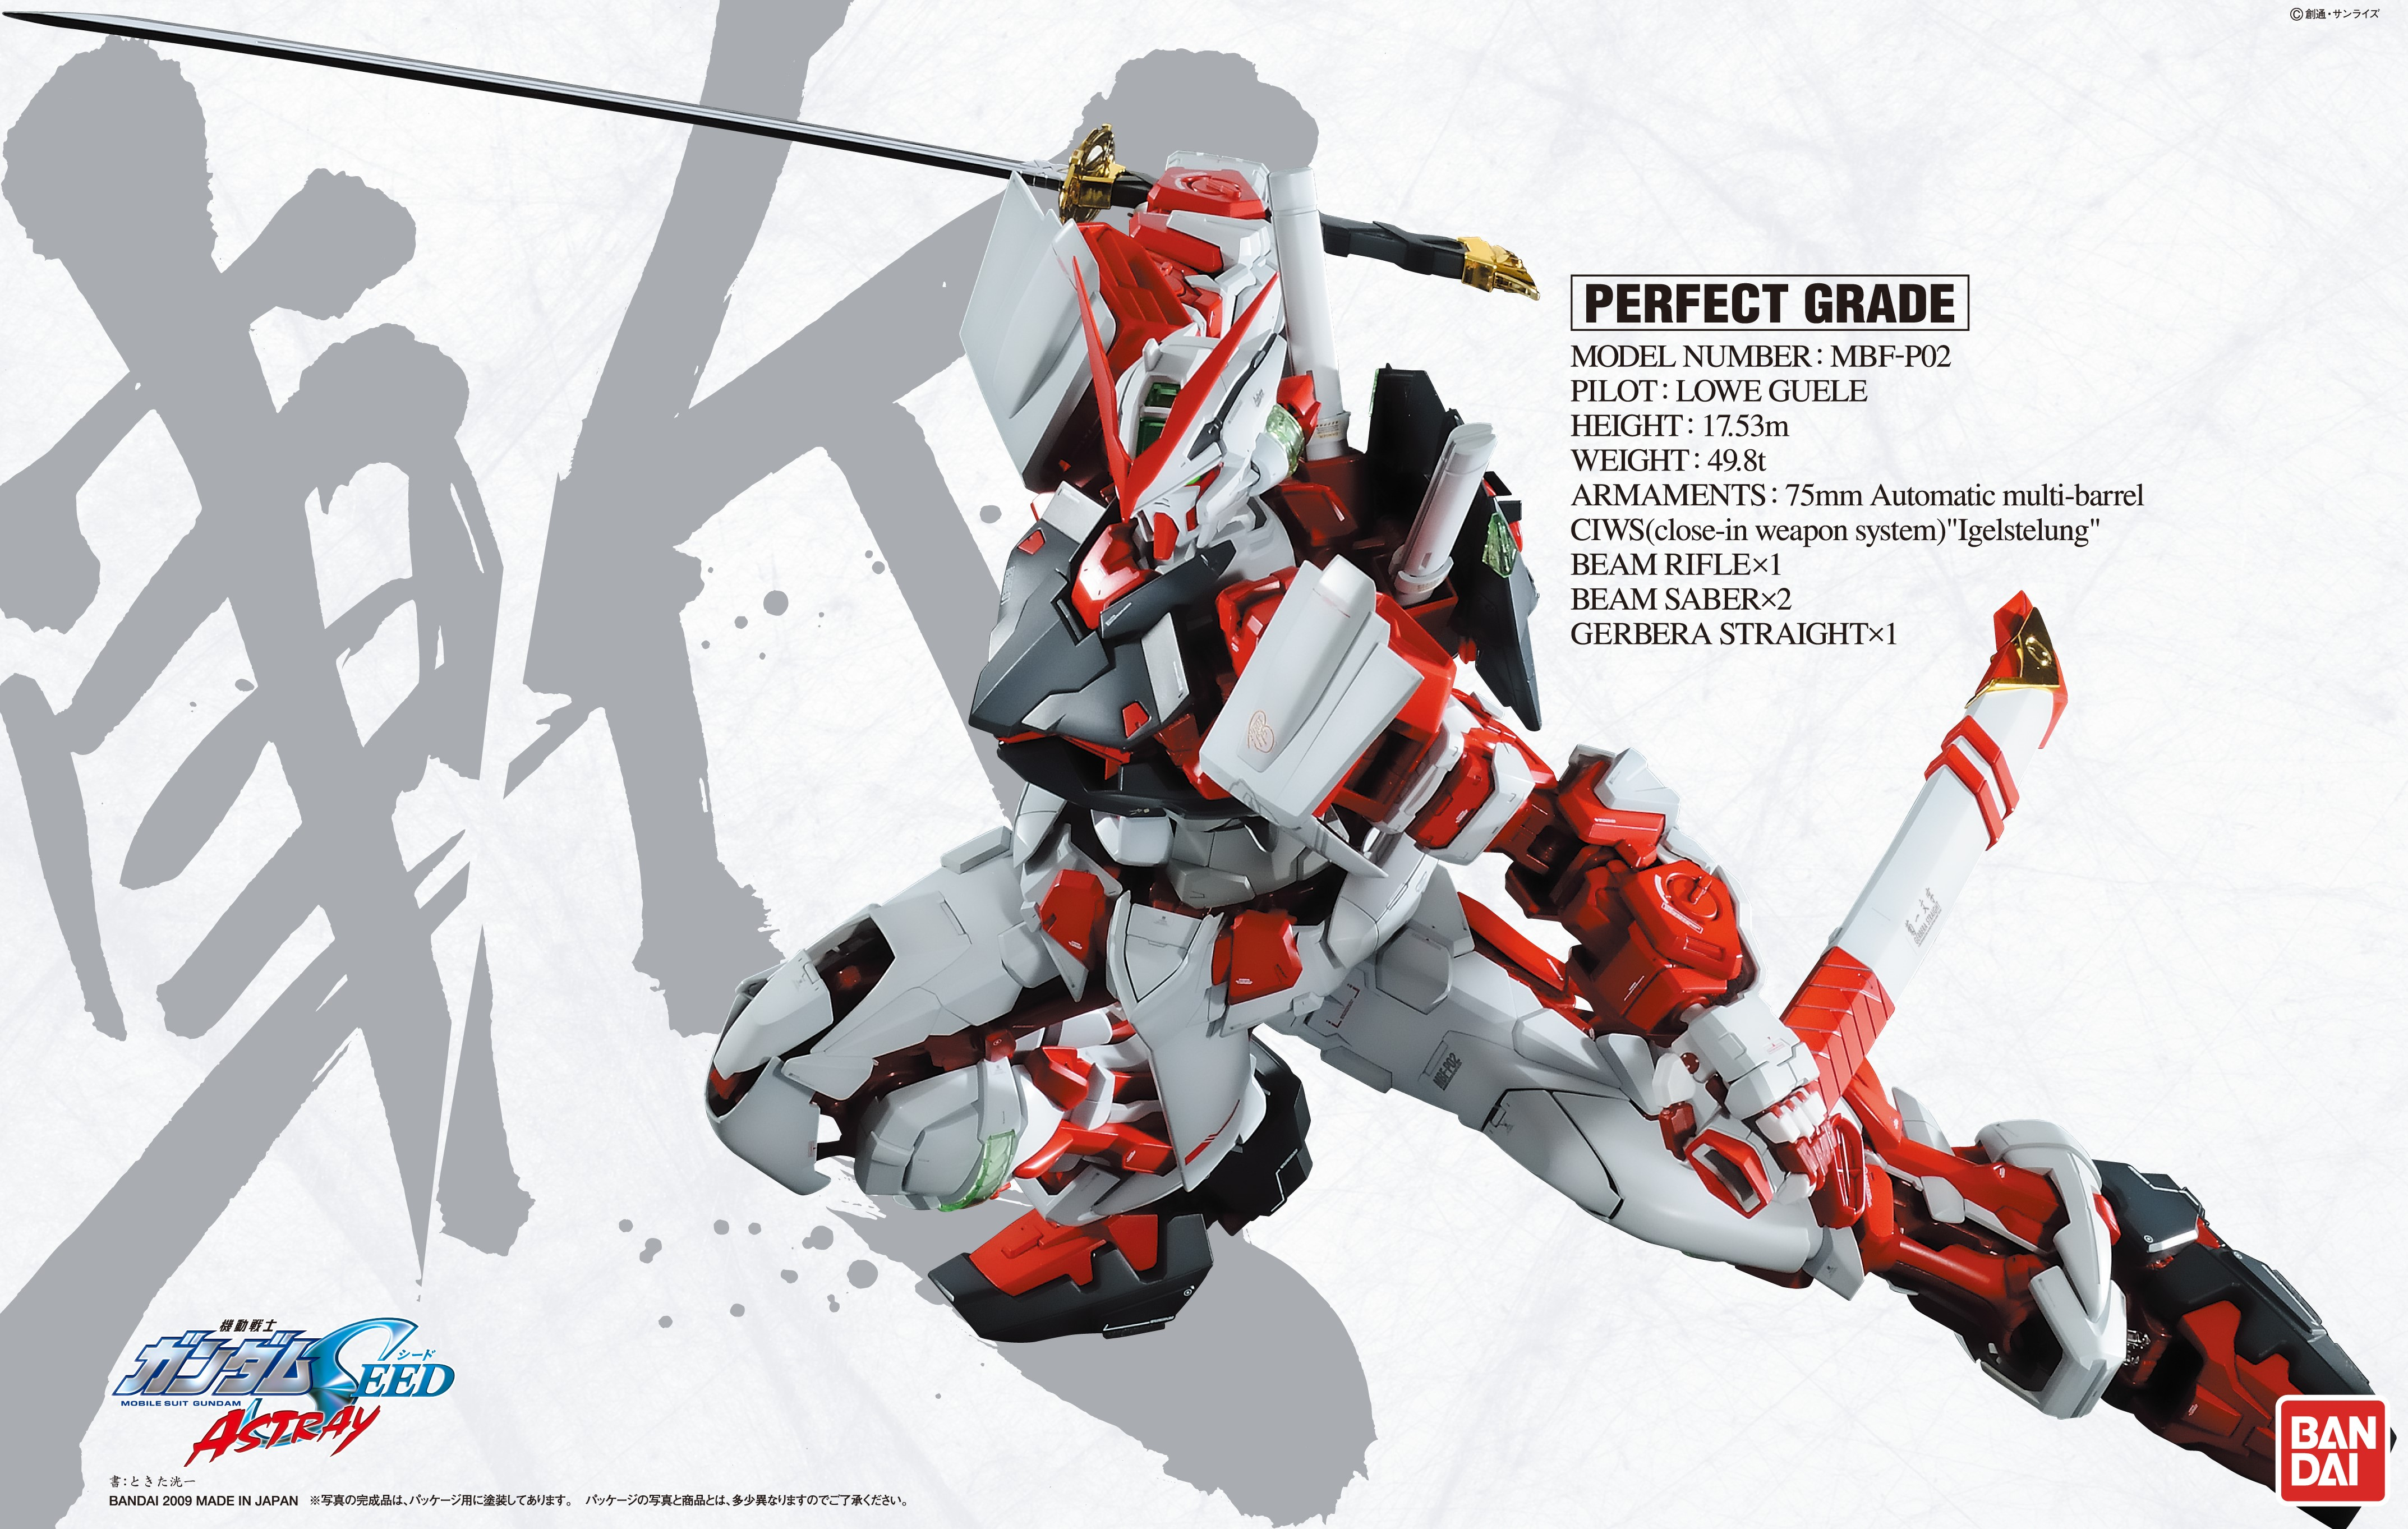 File:Gundam-model-kits-160-pg-mbf-p02-gundam-astray-red-frame-perfect-grade-box.jpg